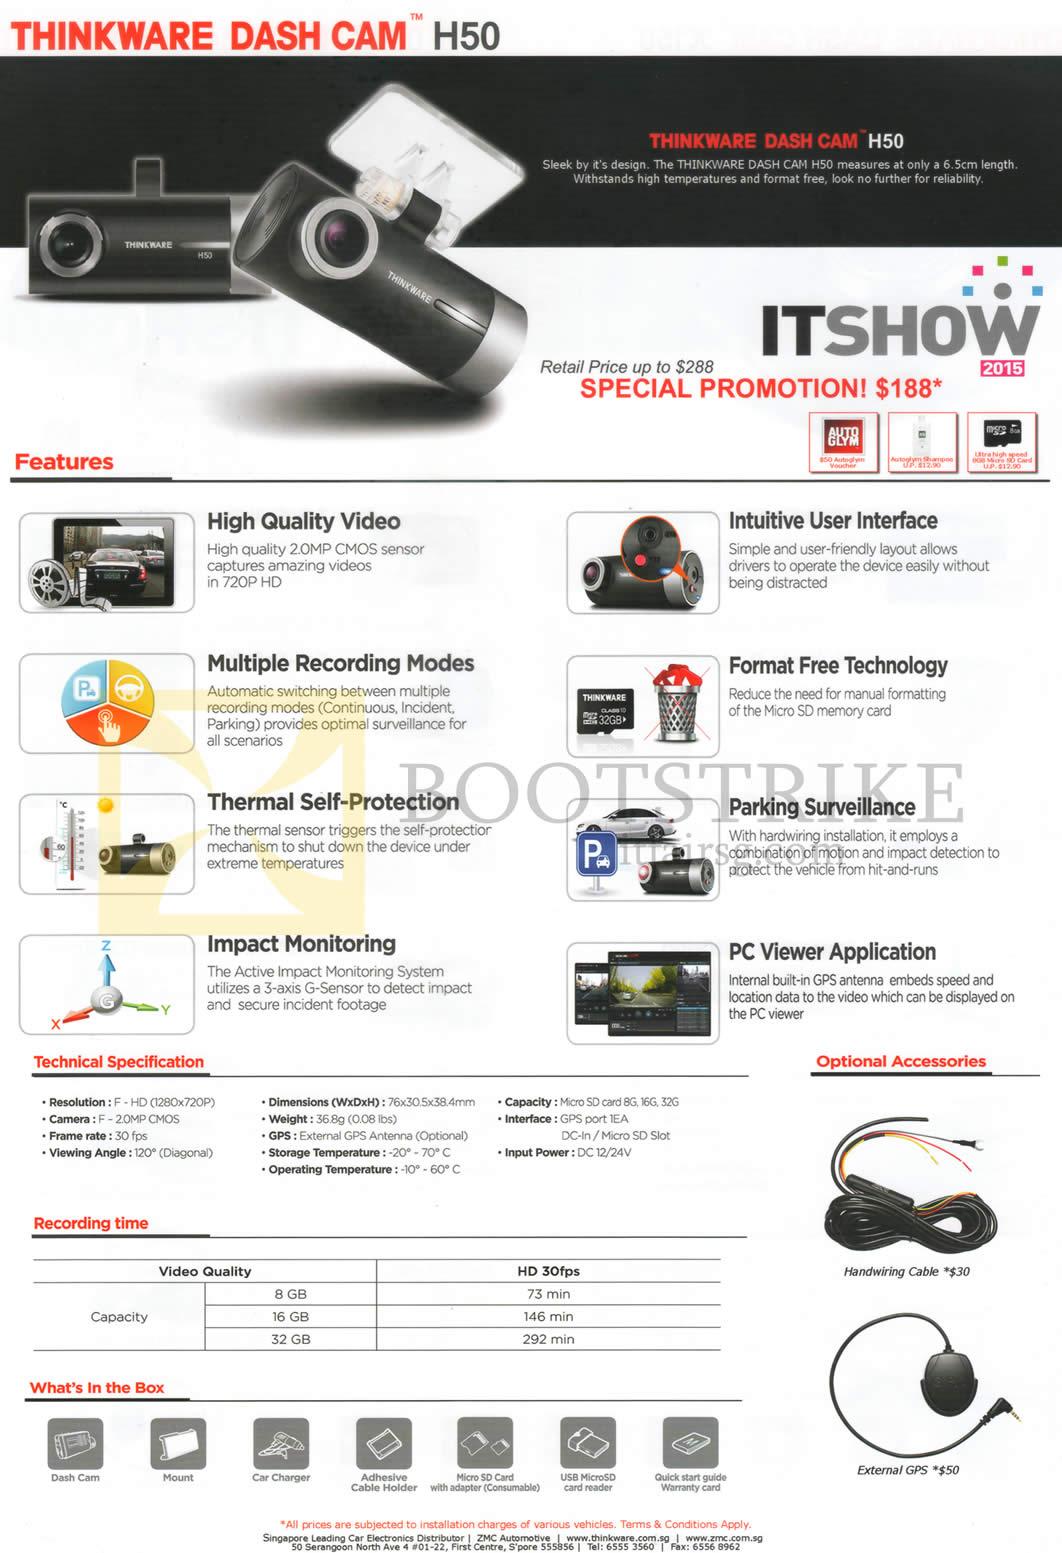 ZMC Automotive Thinkware Dash Cam H50 IT SHOW 2015 Price List